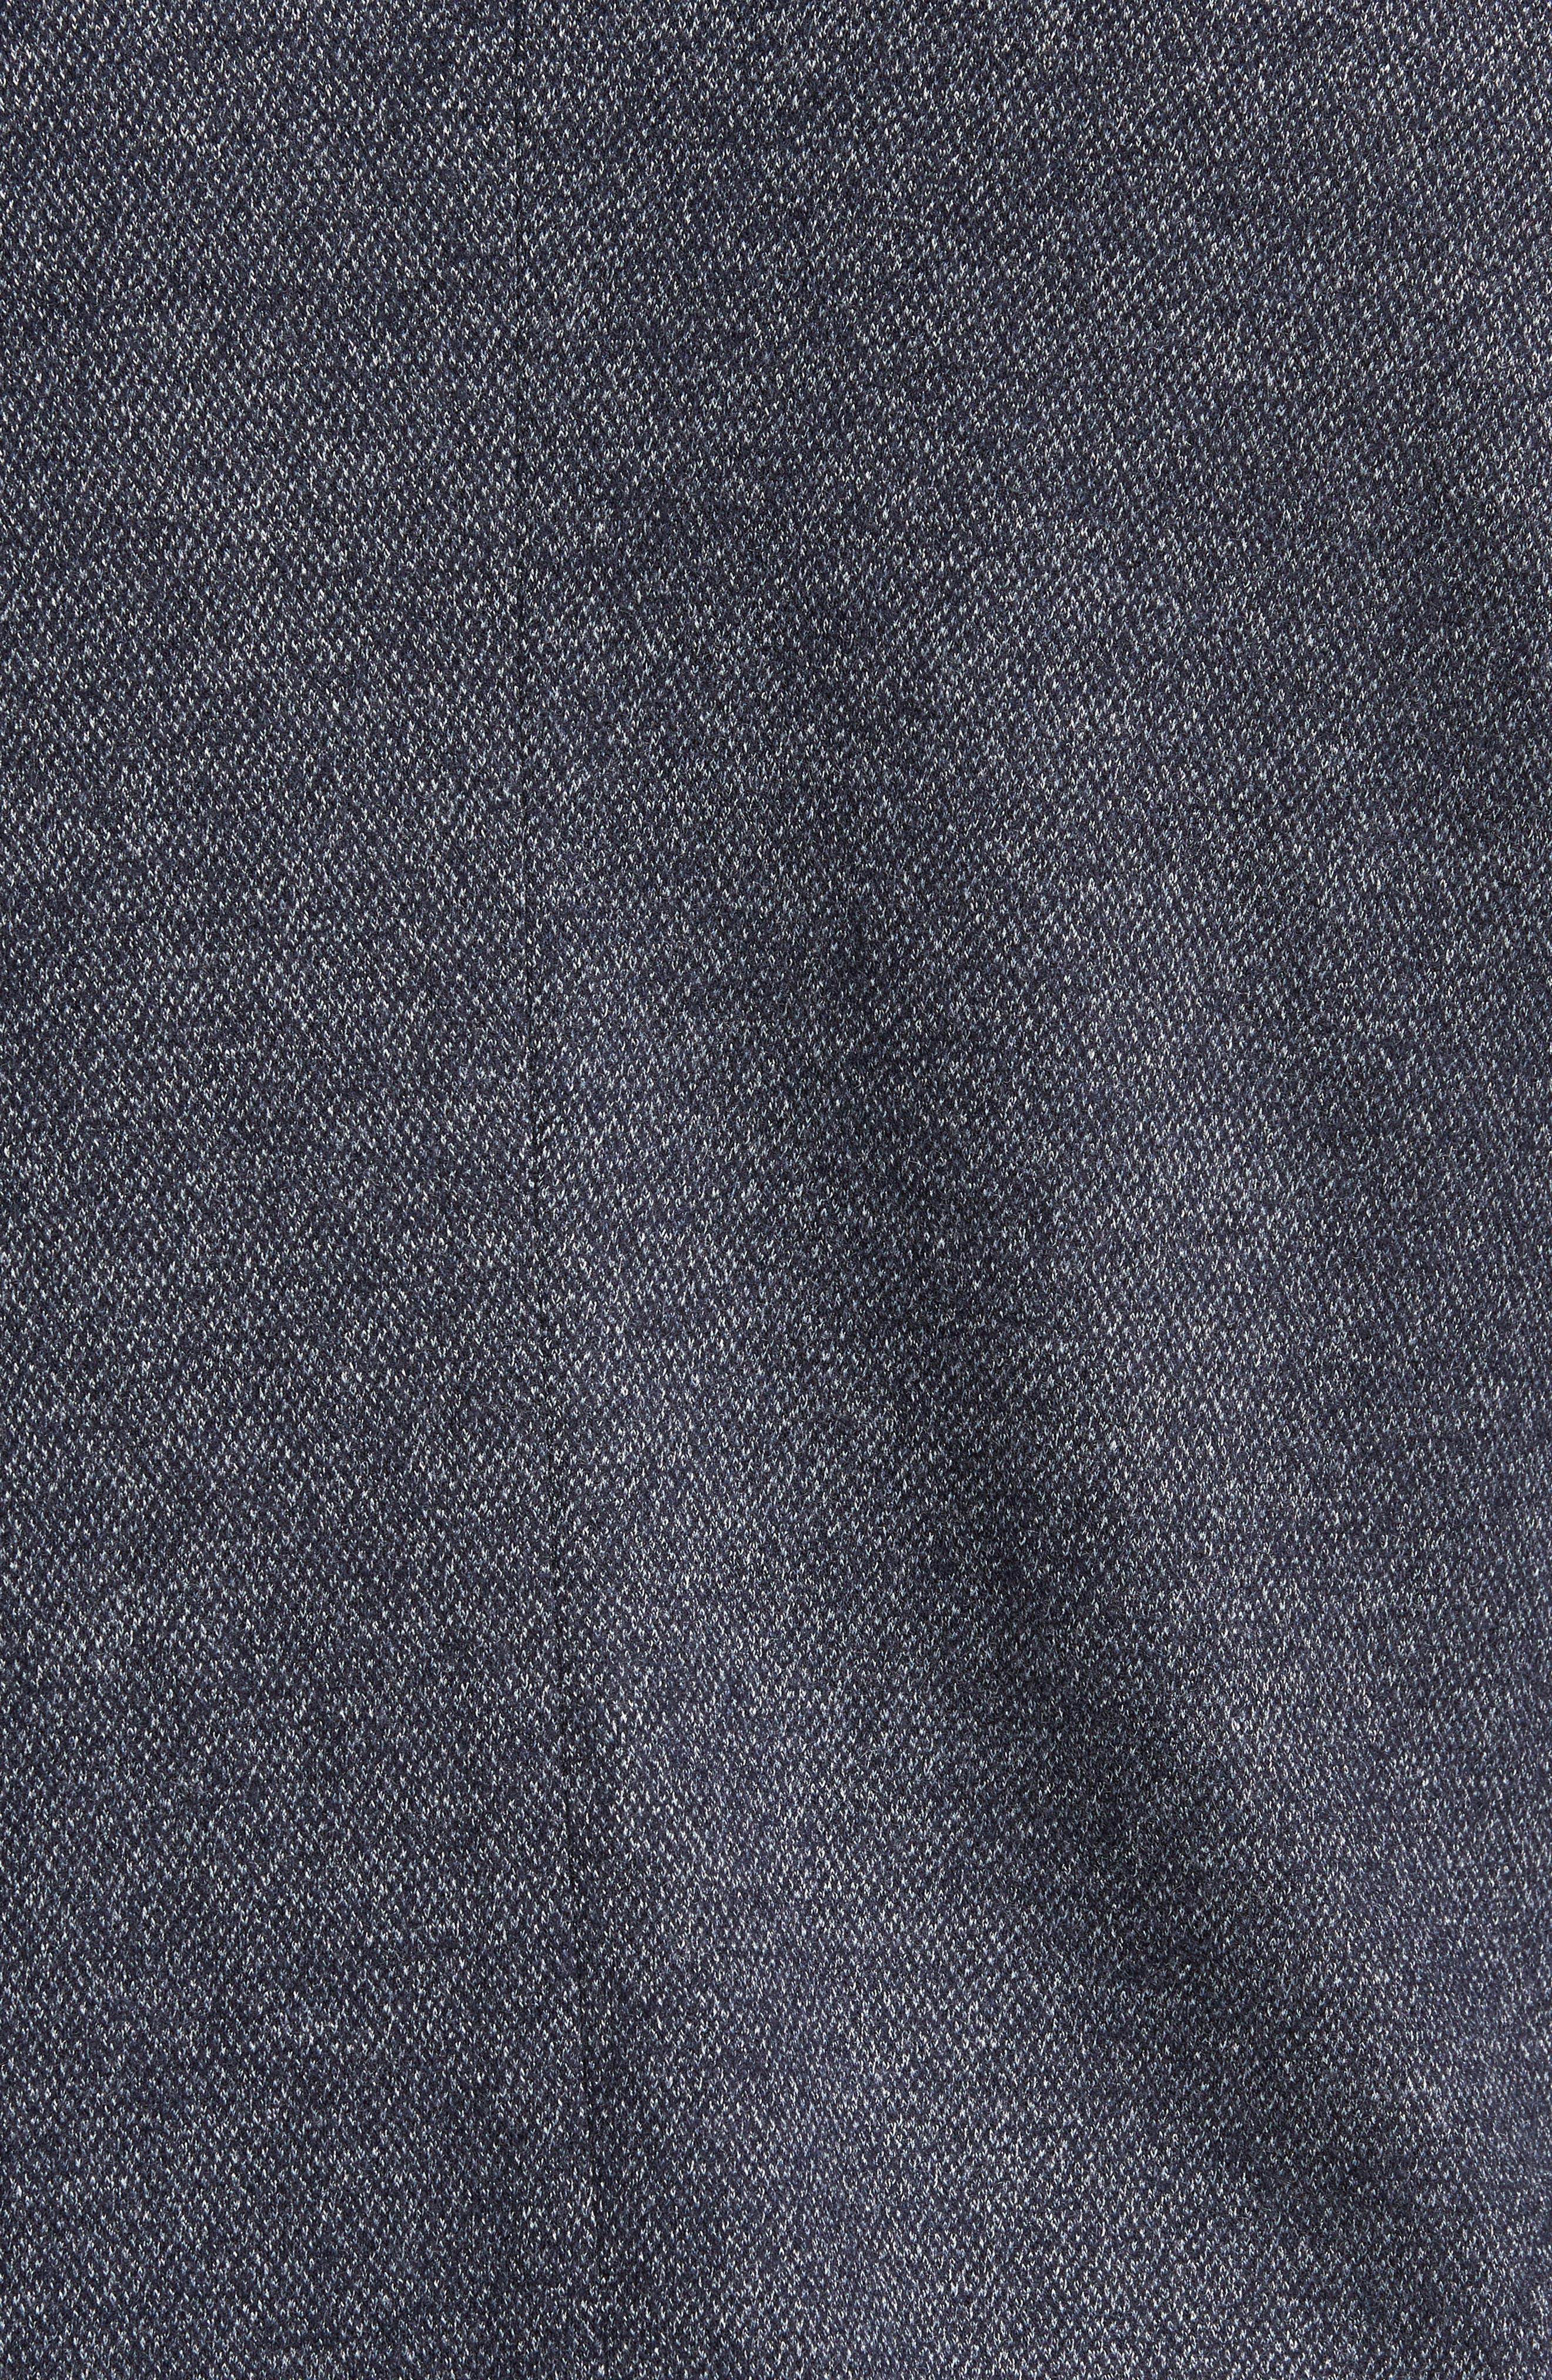 Slim Fit Soft Blazer,                             Alternate thumbnail 6, color,                             410